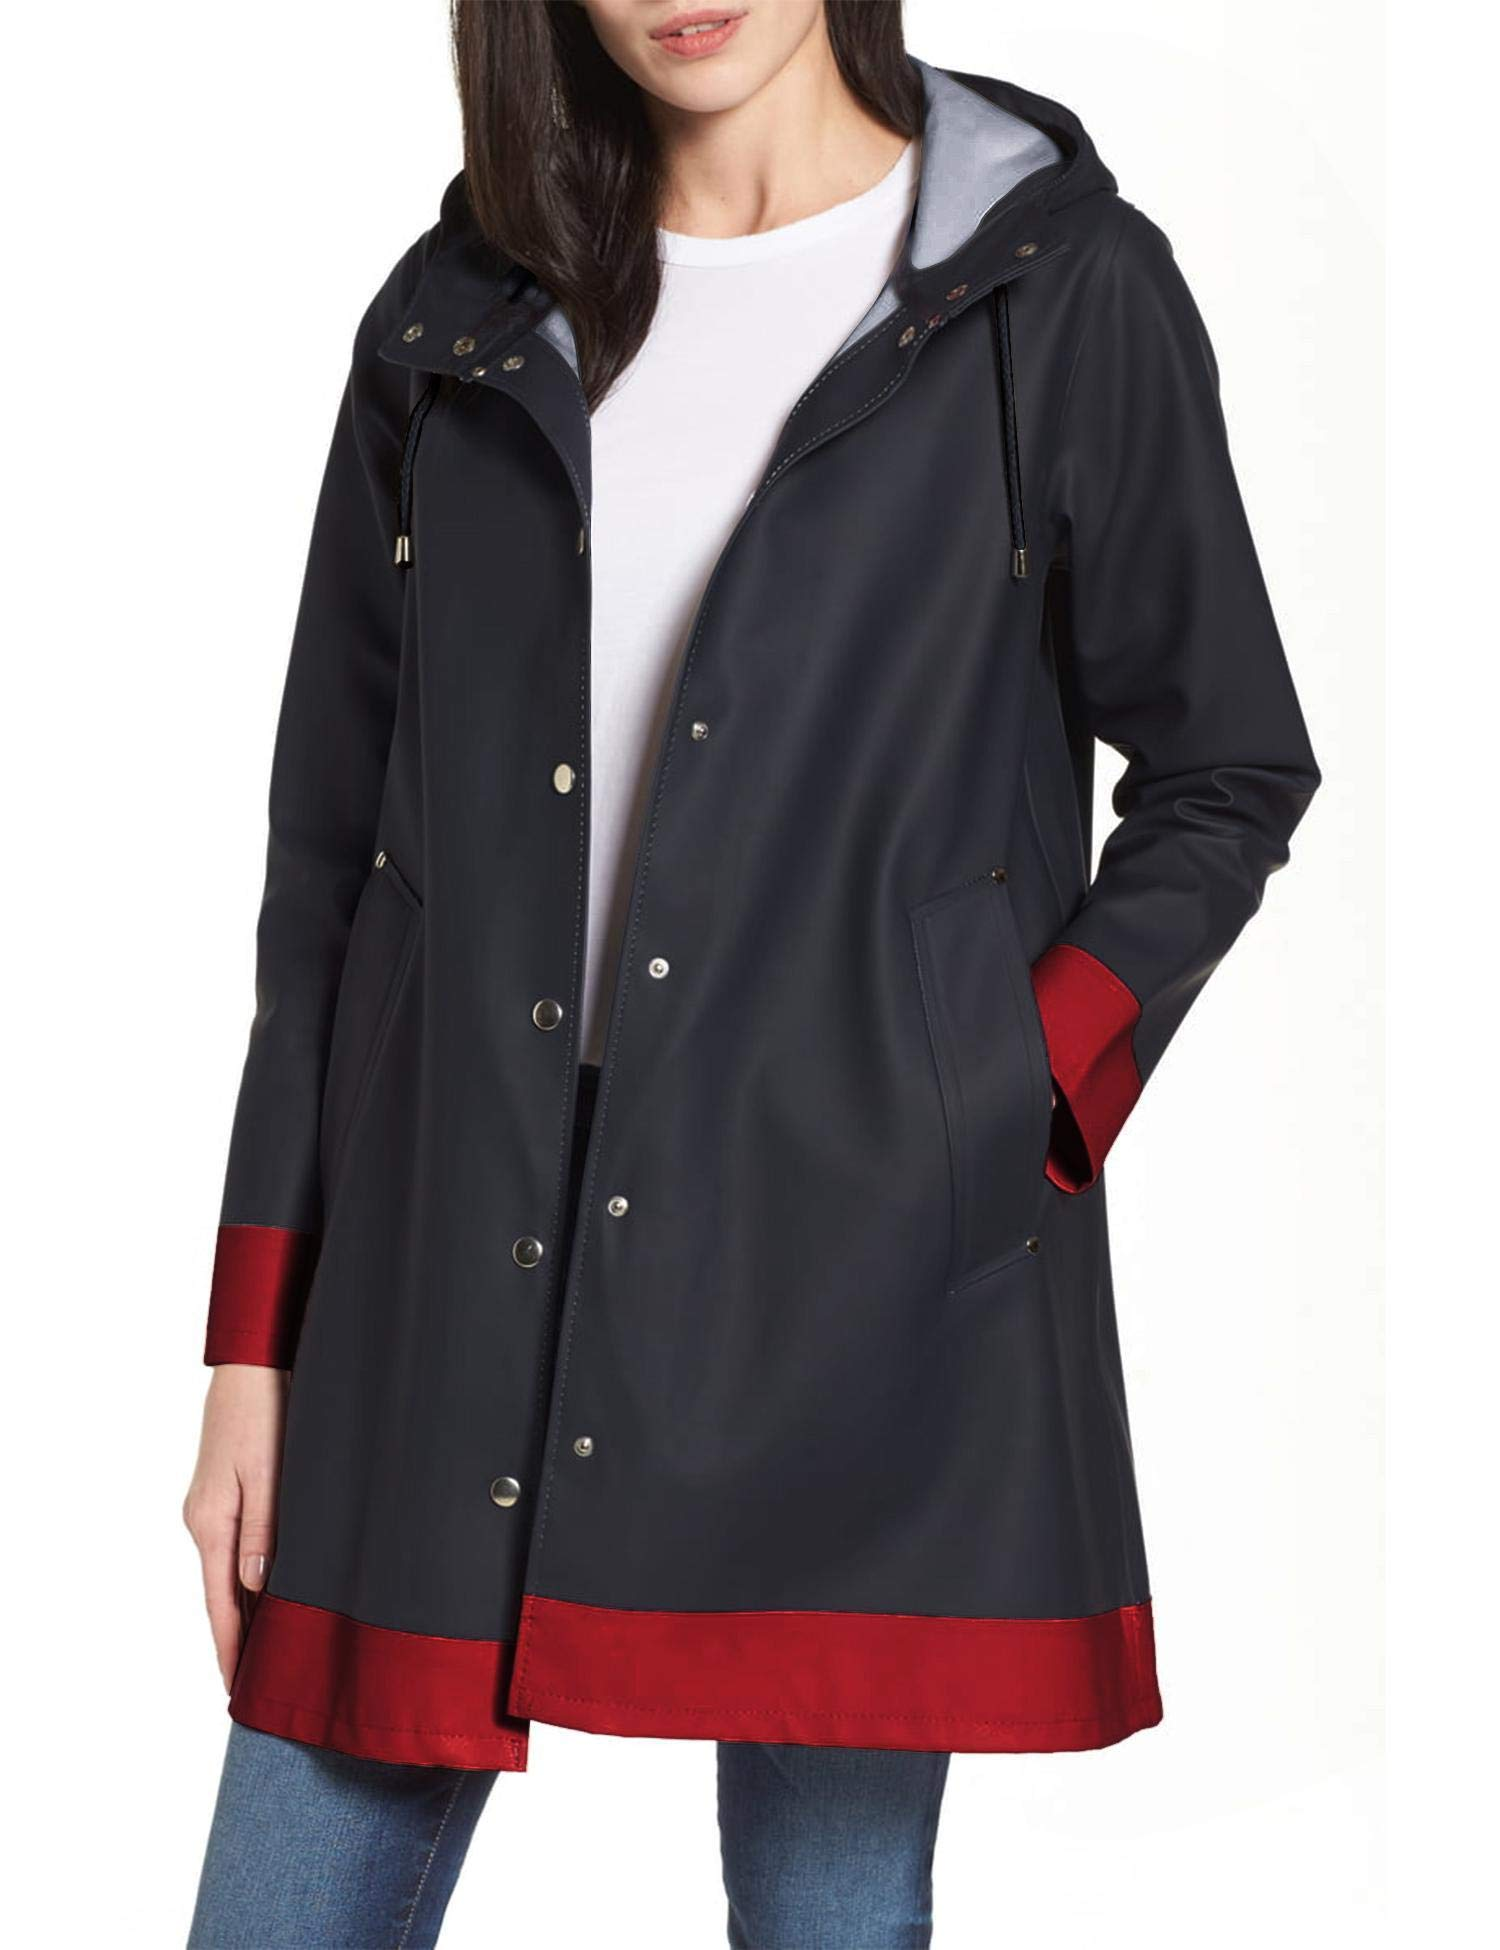 SUNAELIA Women Hooded Raincoat Waterproof Rain Jacket Women's Trench Coats Navy Blue by SUNAELIA